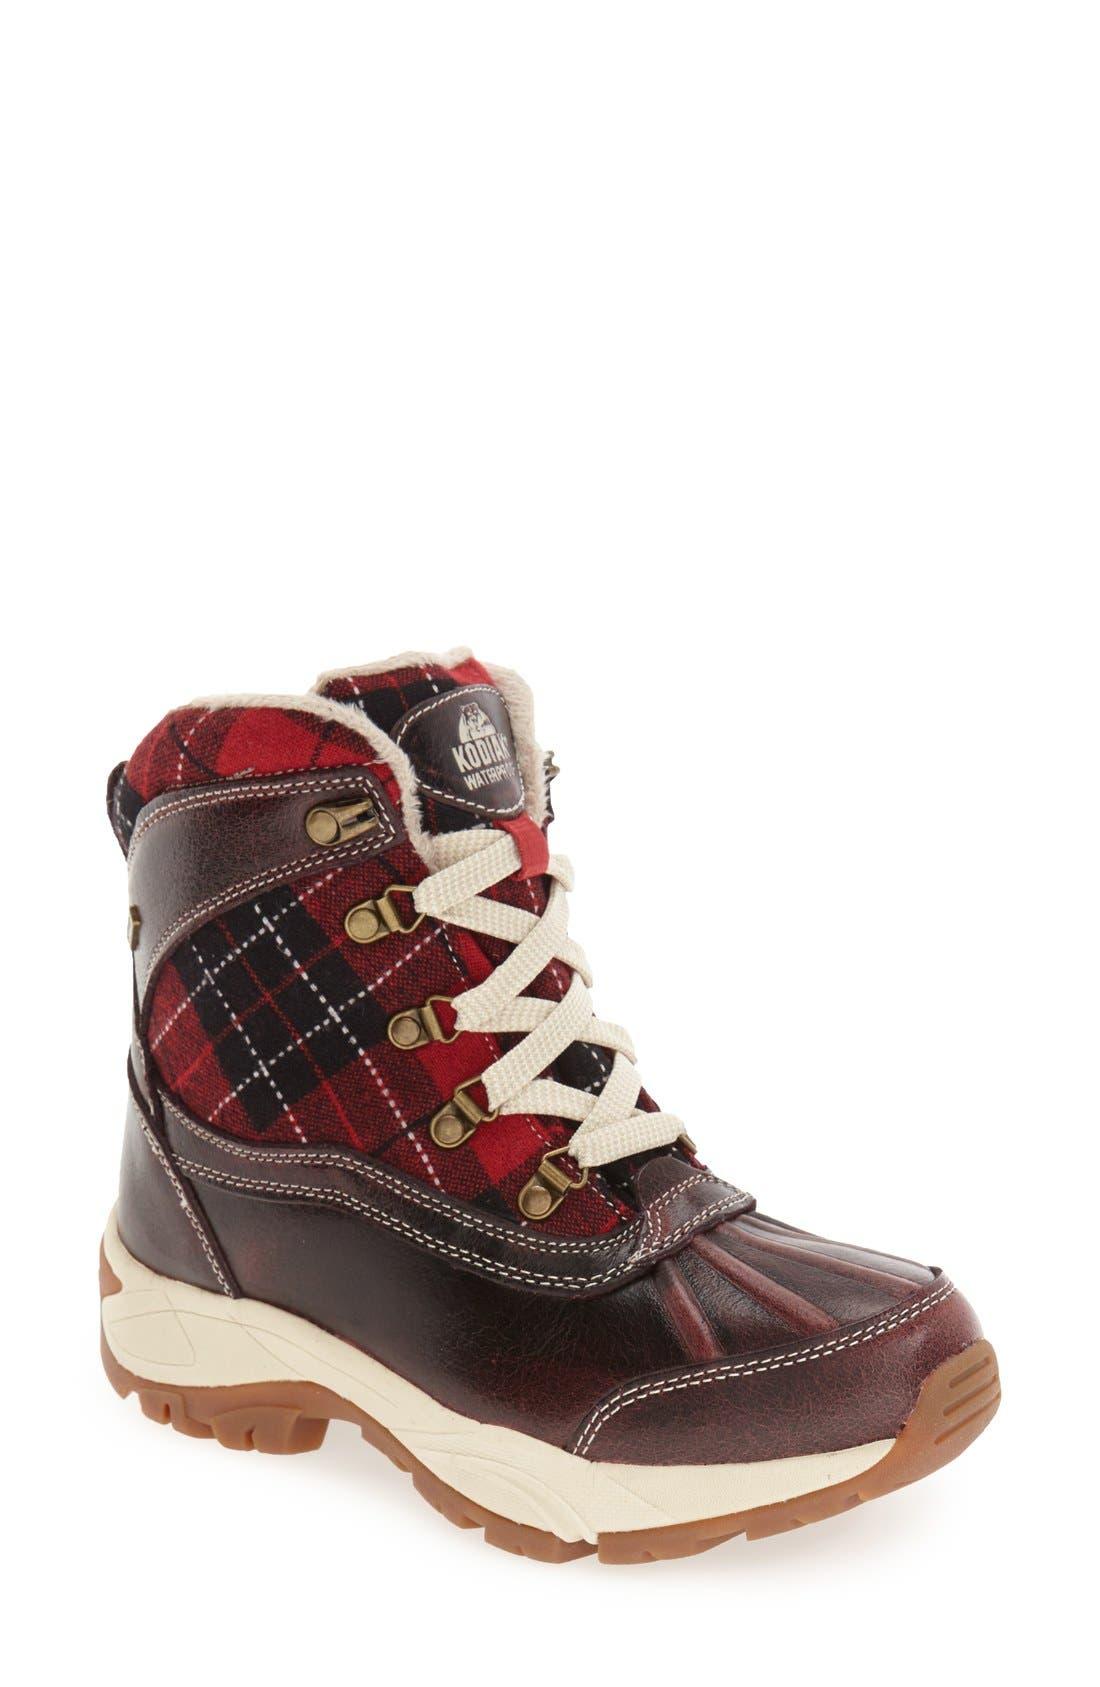 Main Image - Kodiak 'Rochelle' Waterproof Insulated Winter Boot (Women). Black  Leather ...